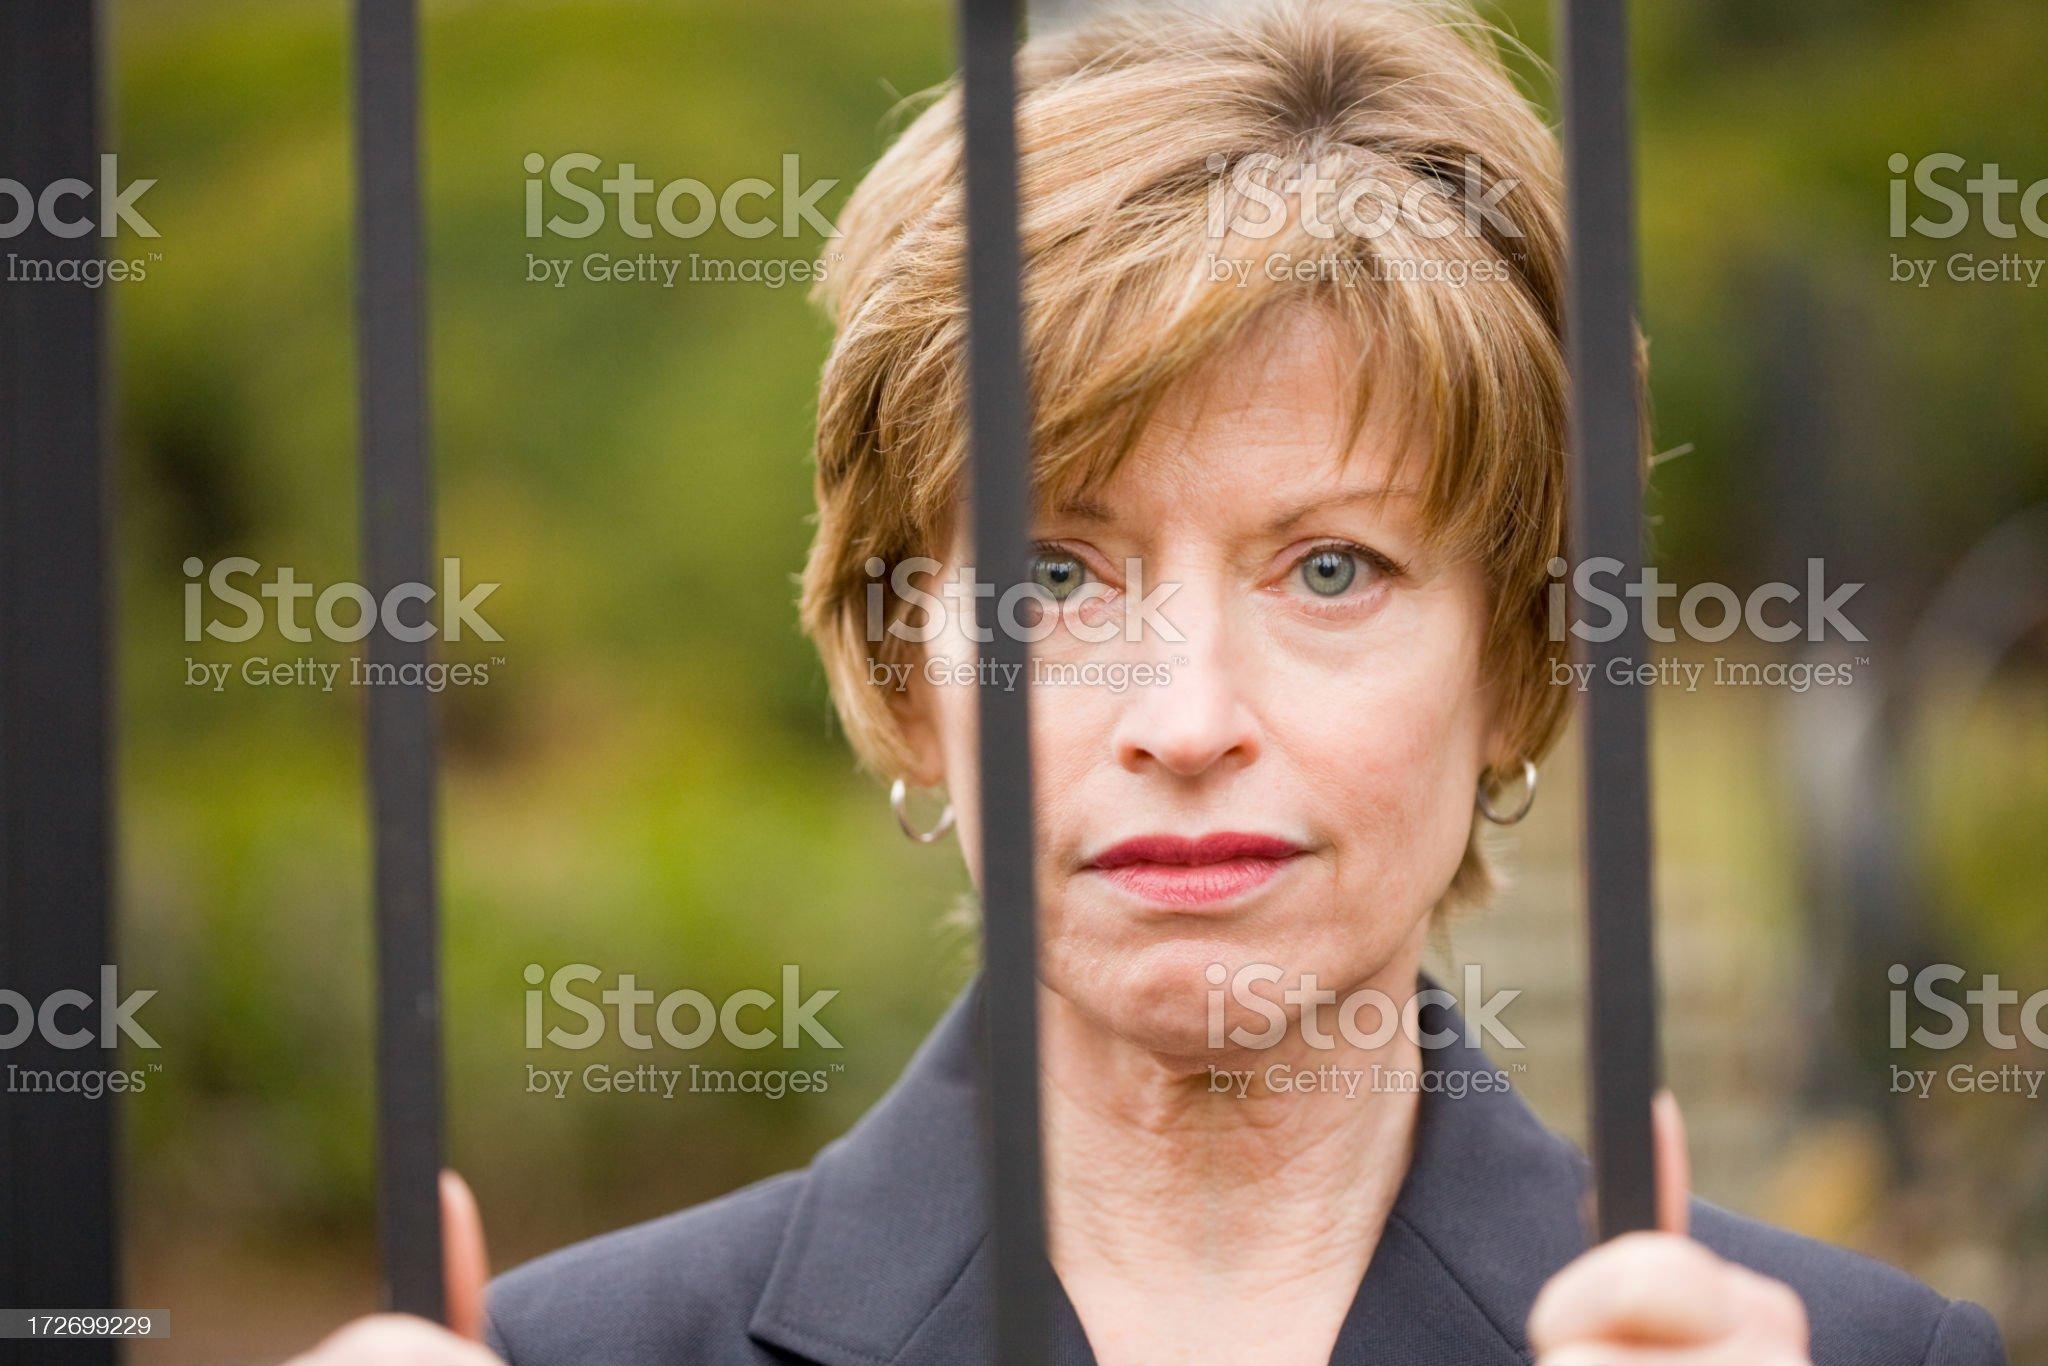 Depressed woman royalty-free stock photo